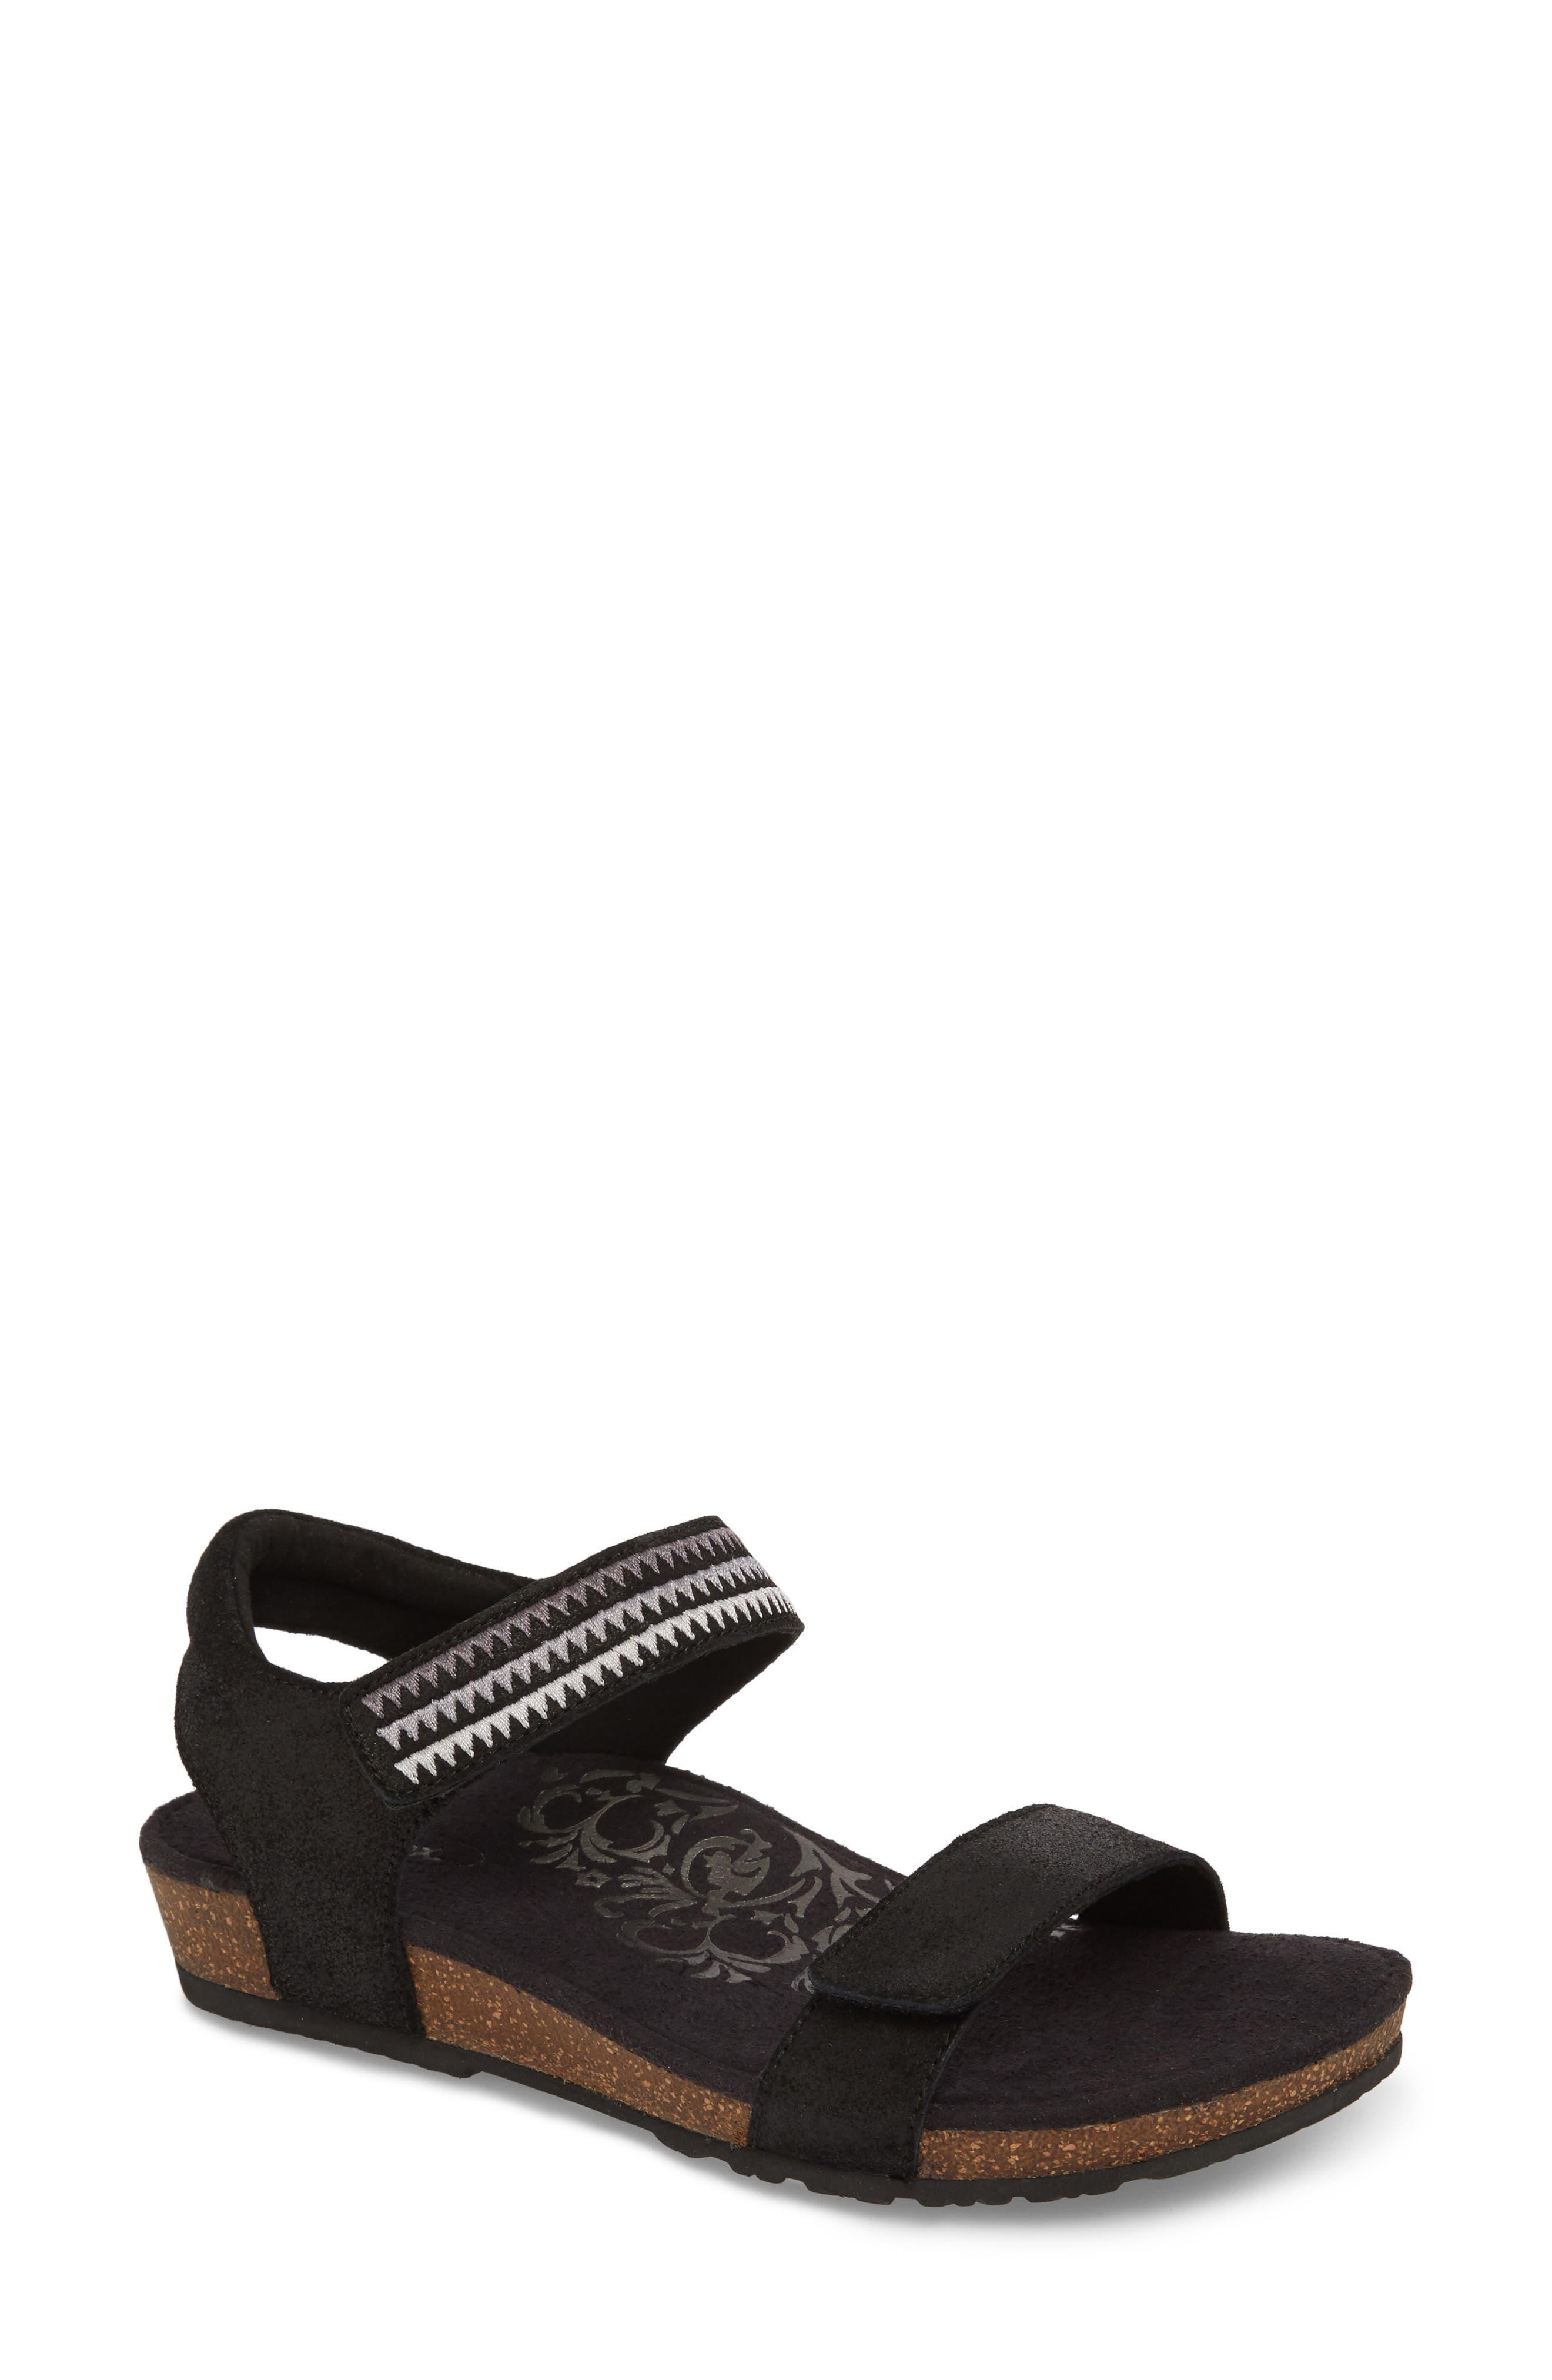 Aetrex Capri Wedge Sandal (Women)